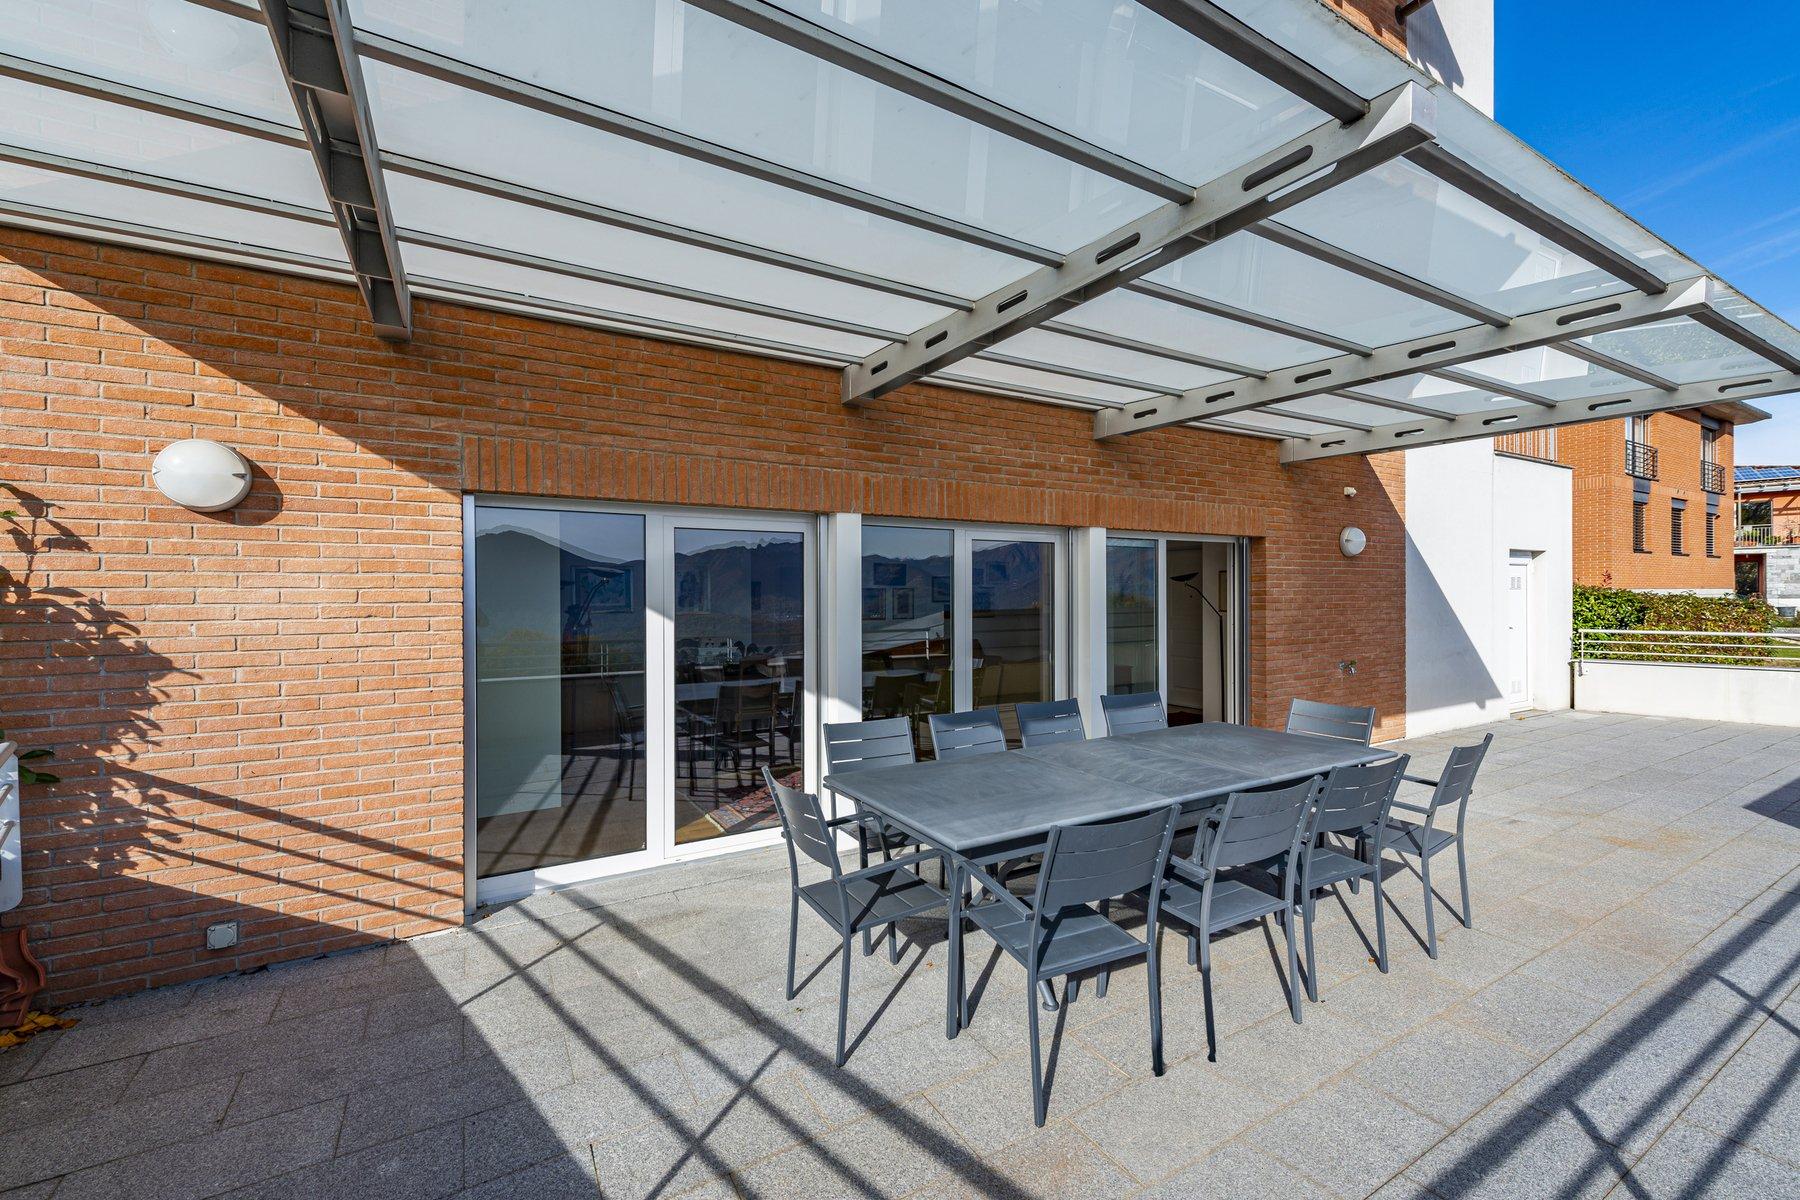 Wohnung in Alto Malcantone, Tessin, Schweiz 1 - 11212741